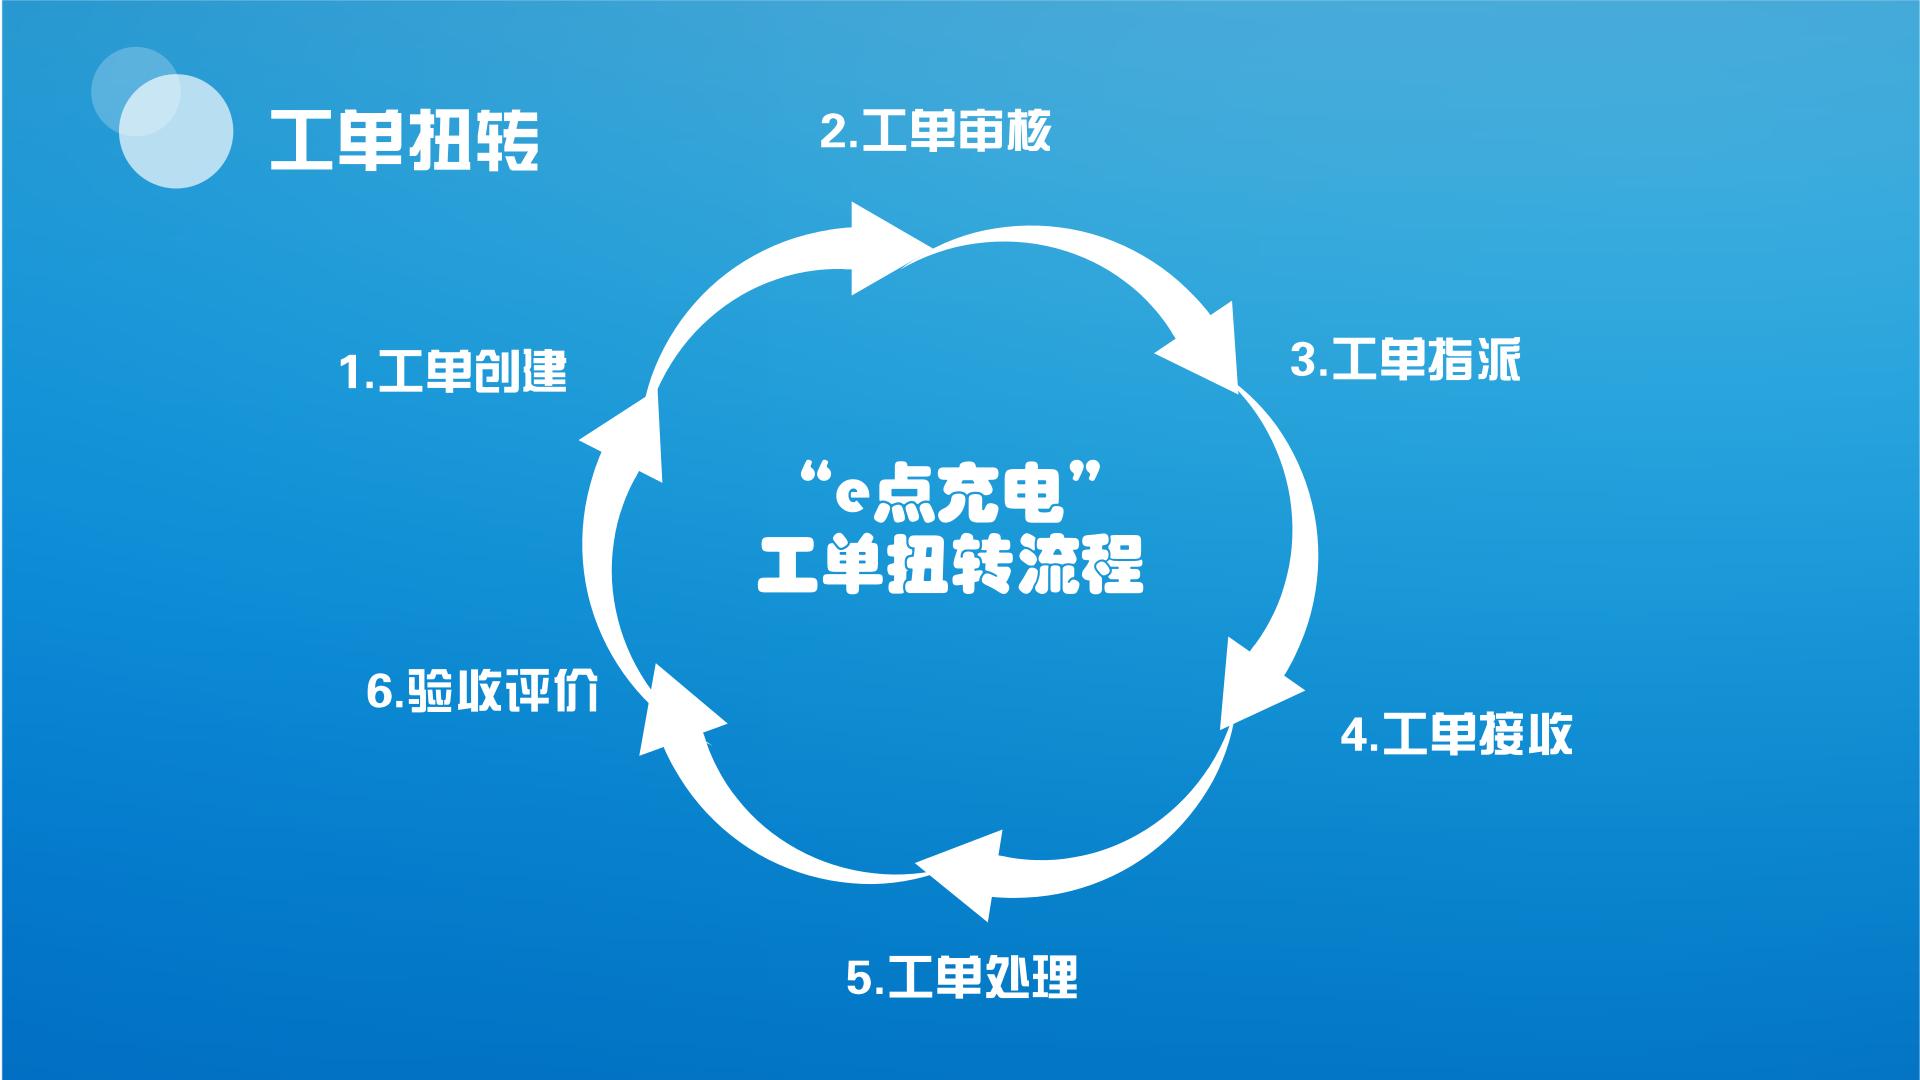 桩小秘配图_PPT+16_9_2019.01.24.png